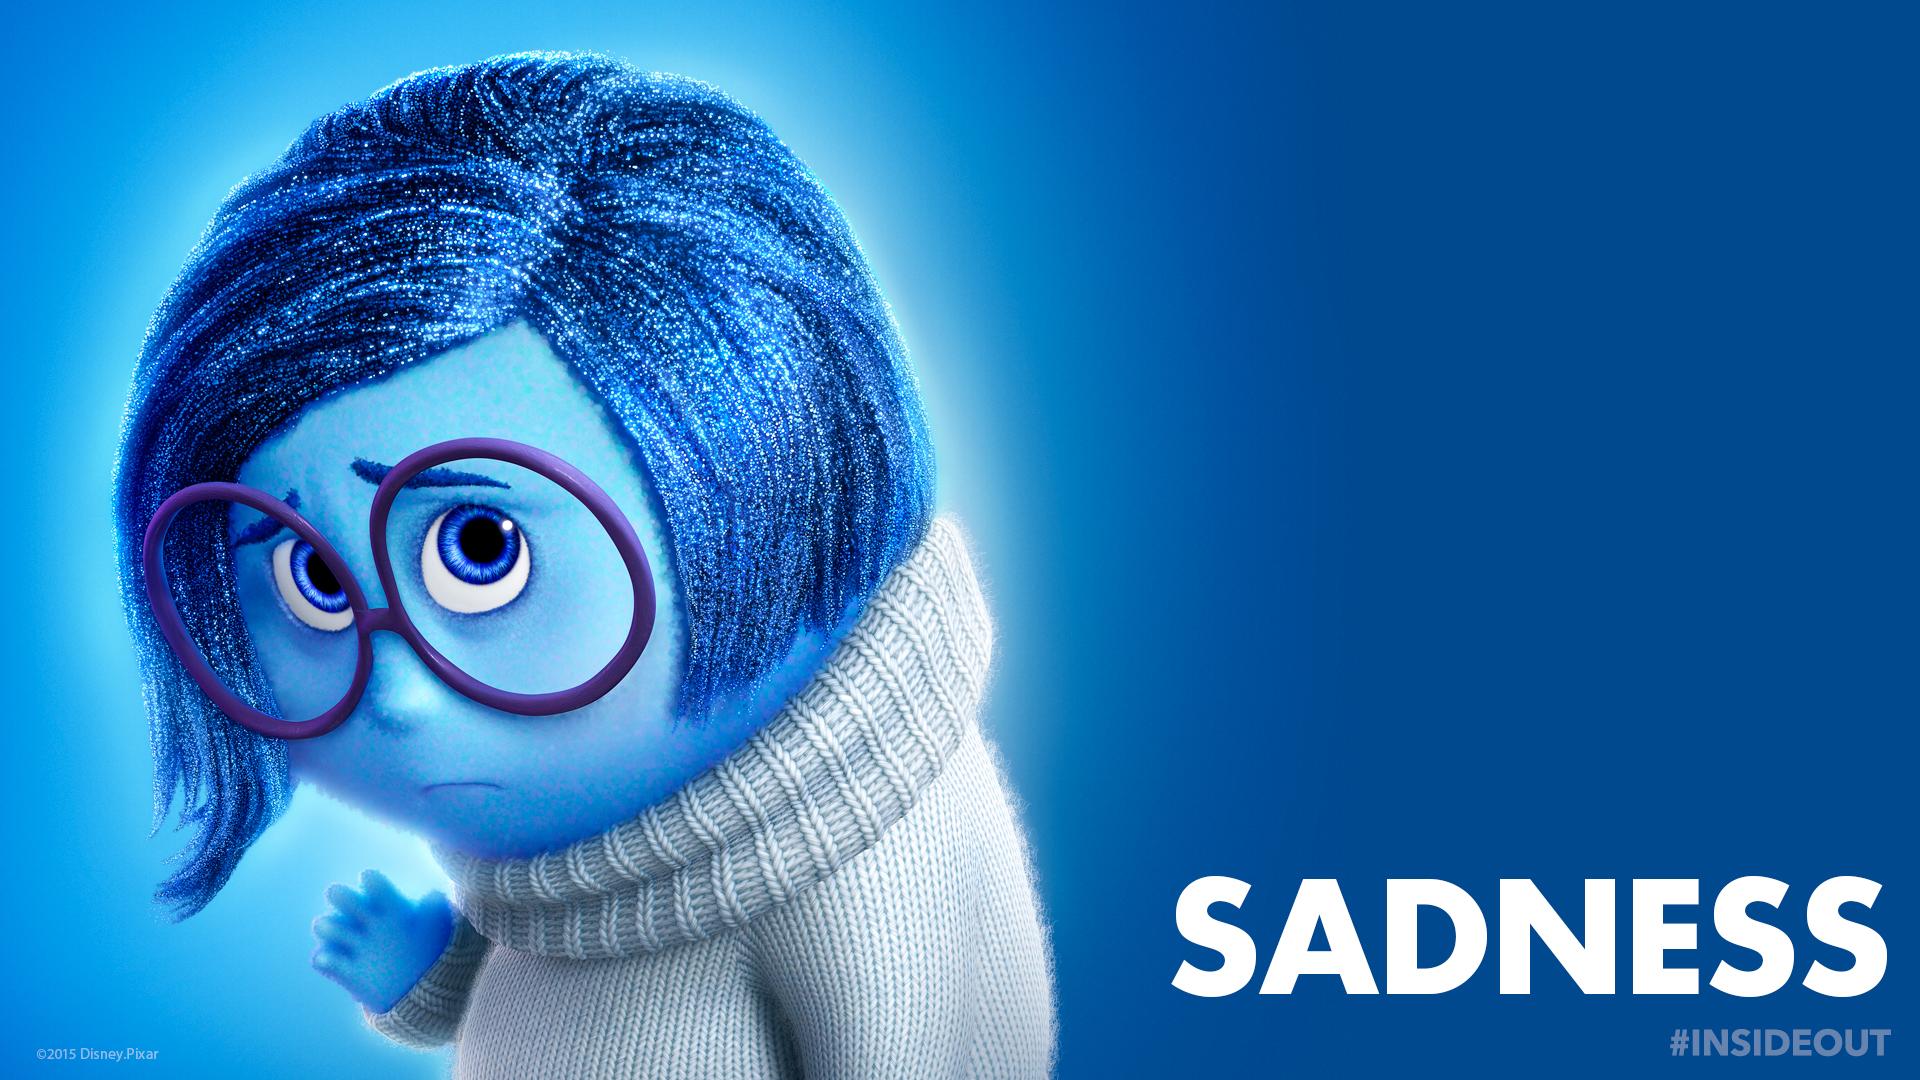 Inside Out Sadness Wallpaper Pixar Wallpaper 38596544